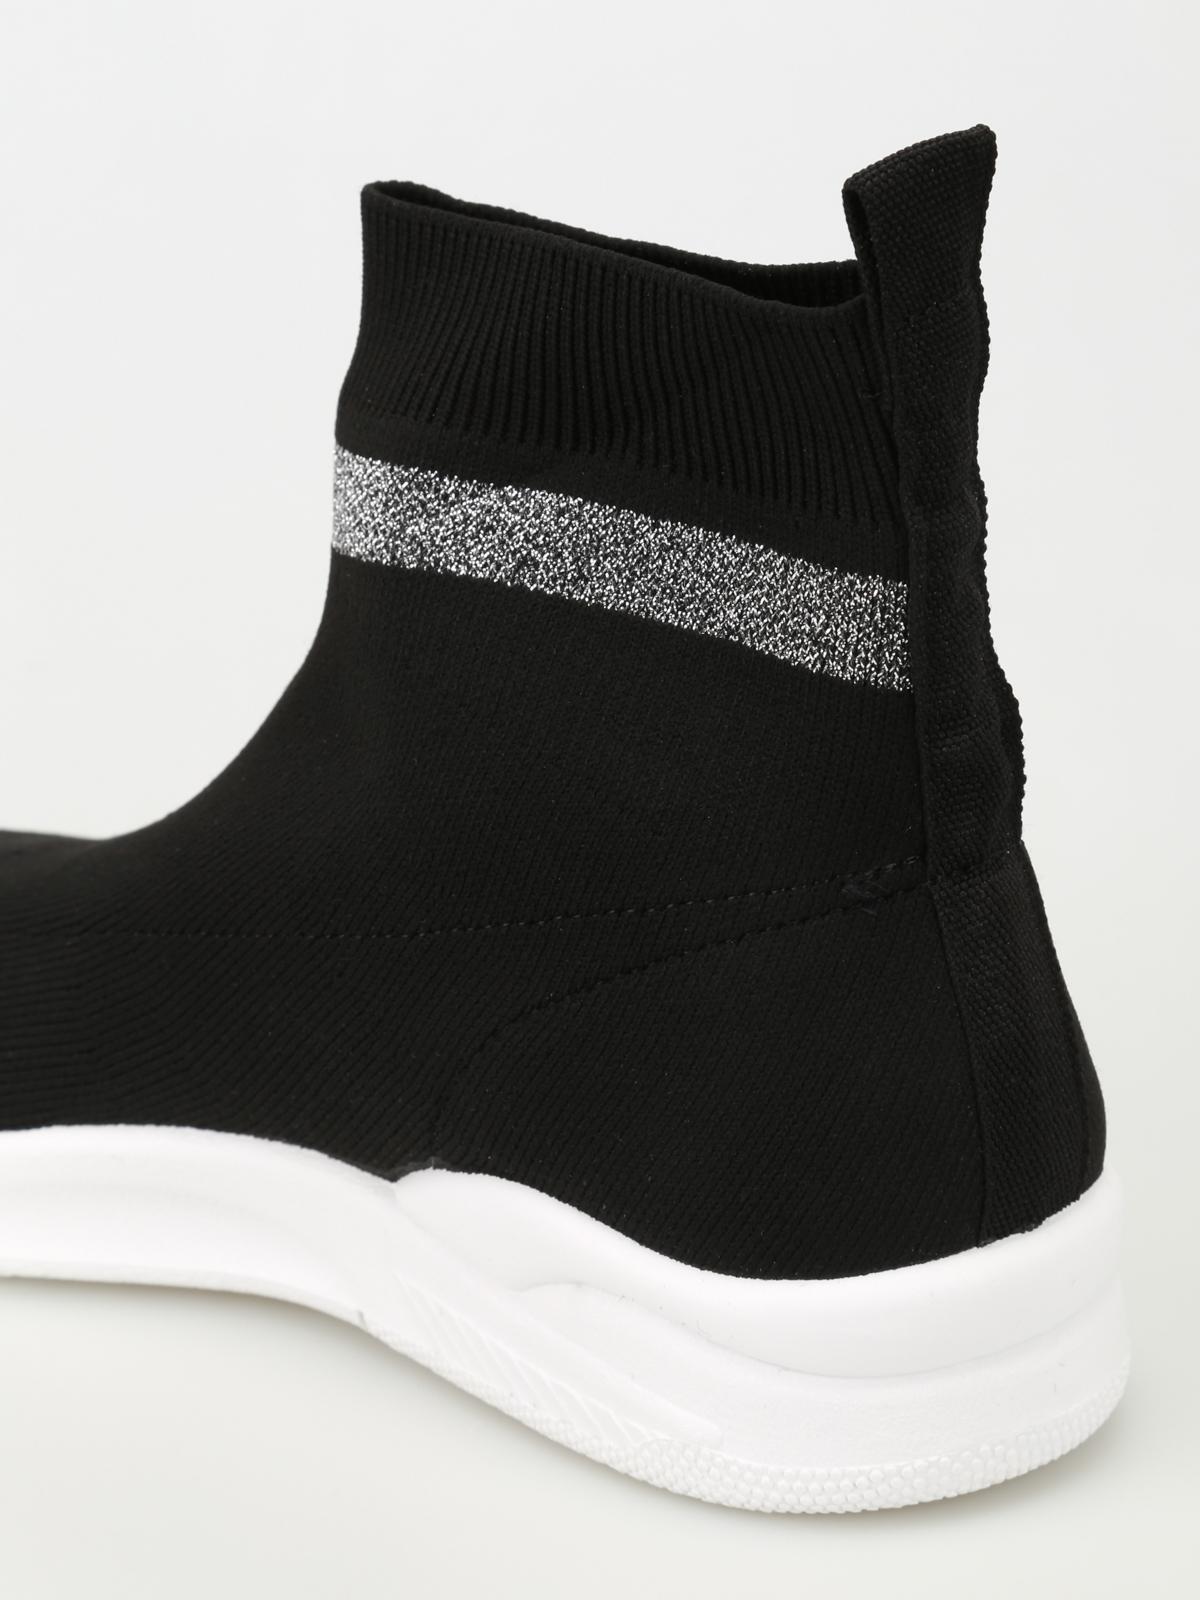 Chiara Ferragni Active sneakers Yx0yE3ew